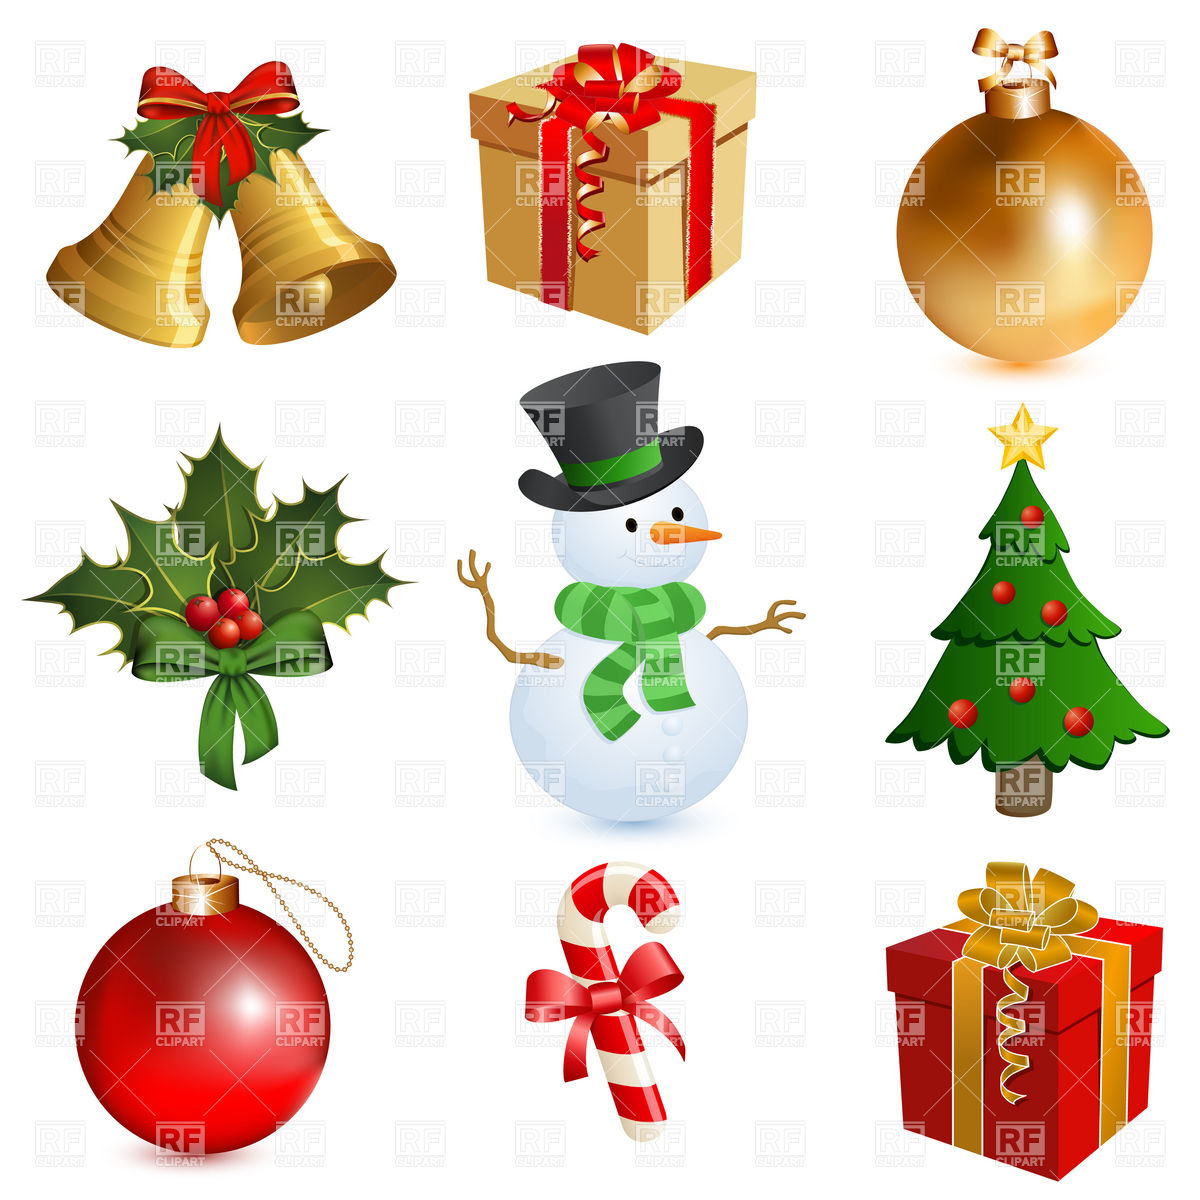 Decoration clipart holly Clipart%20christmas%20party Christmas Clipart Party Clipart